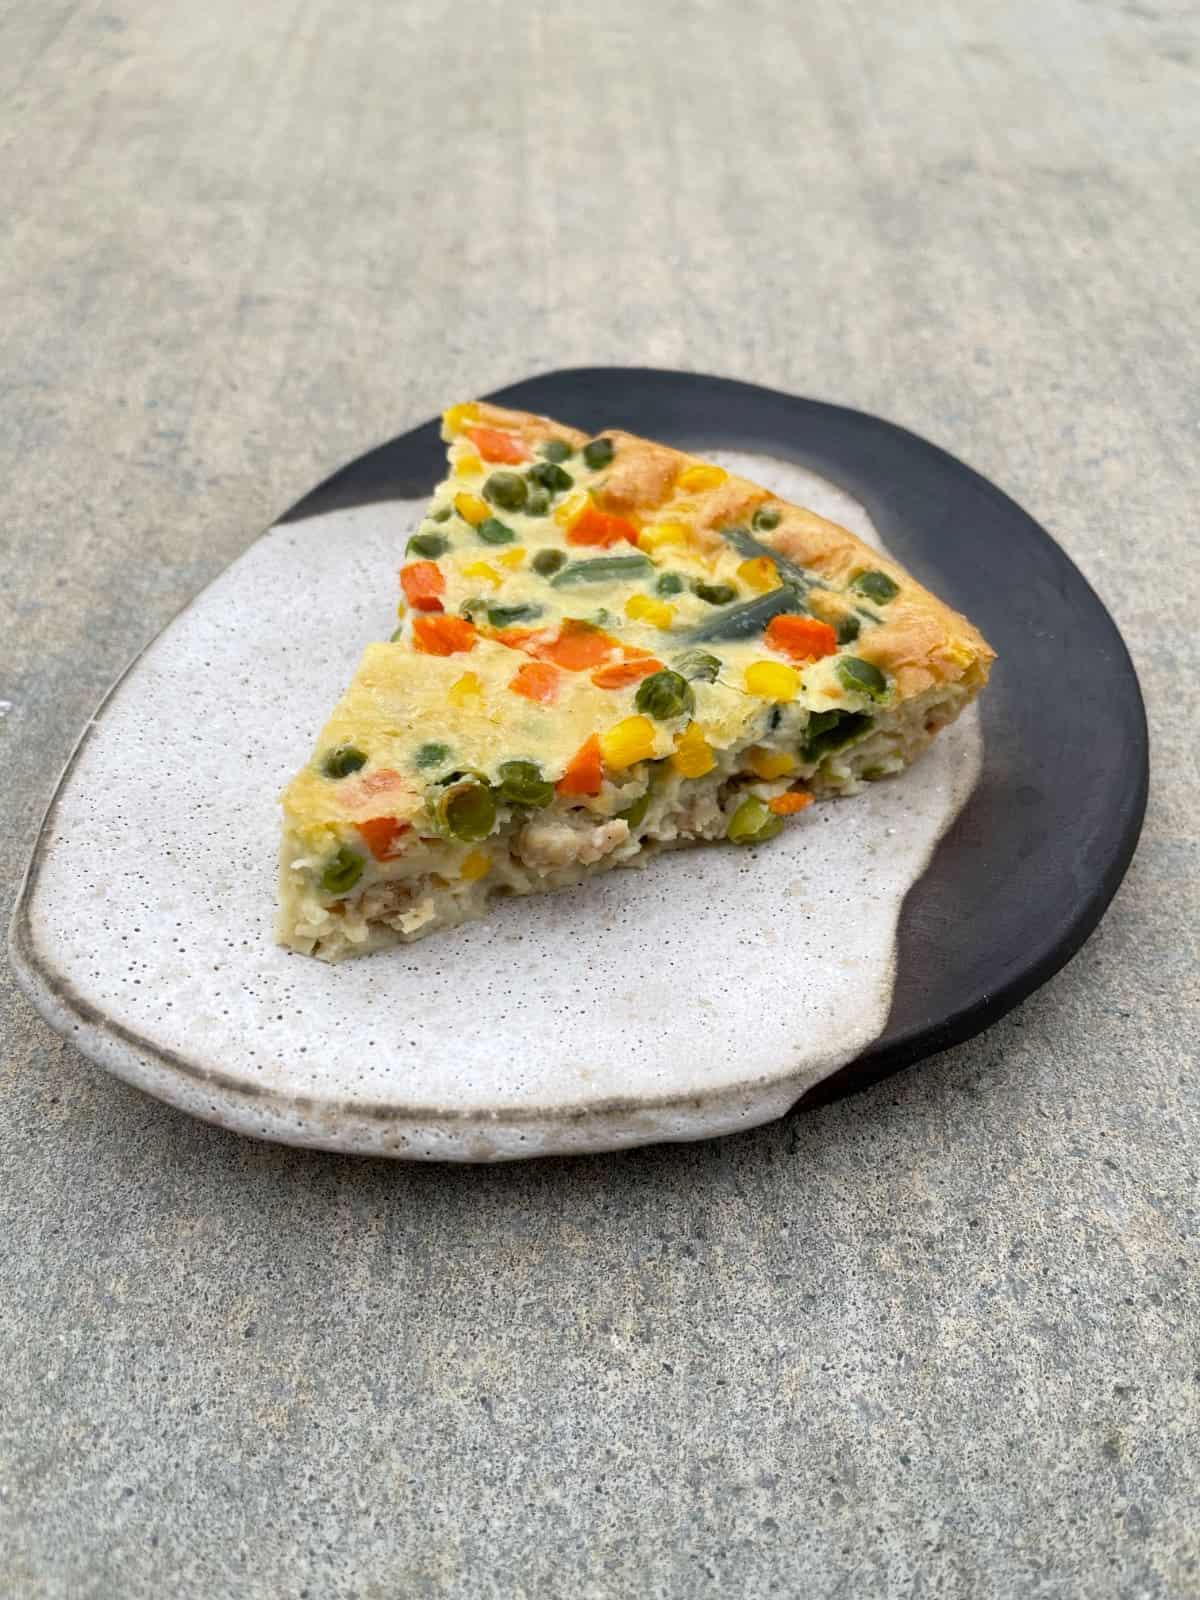 Slice of Chicken Sausage Pie on ceramic plate.